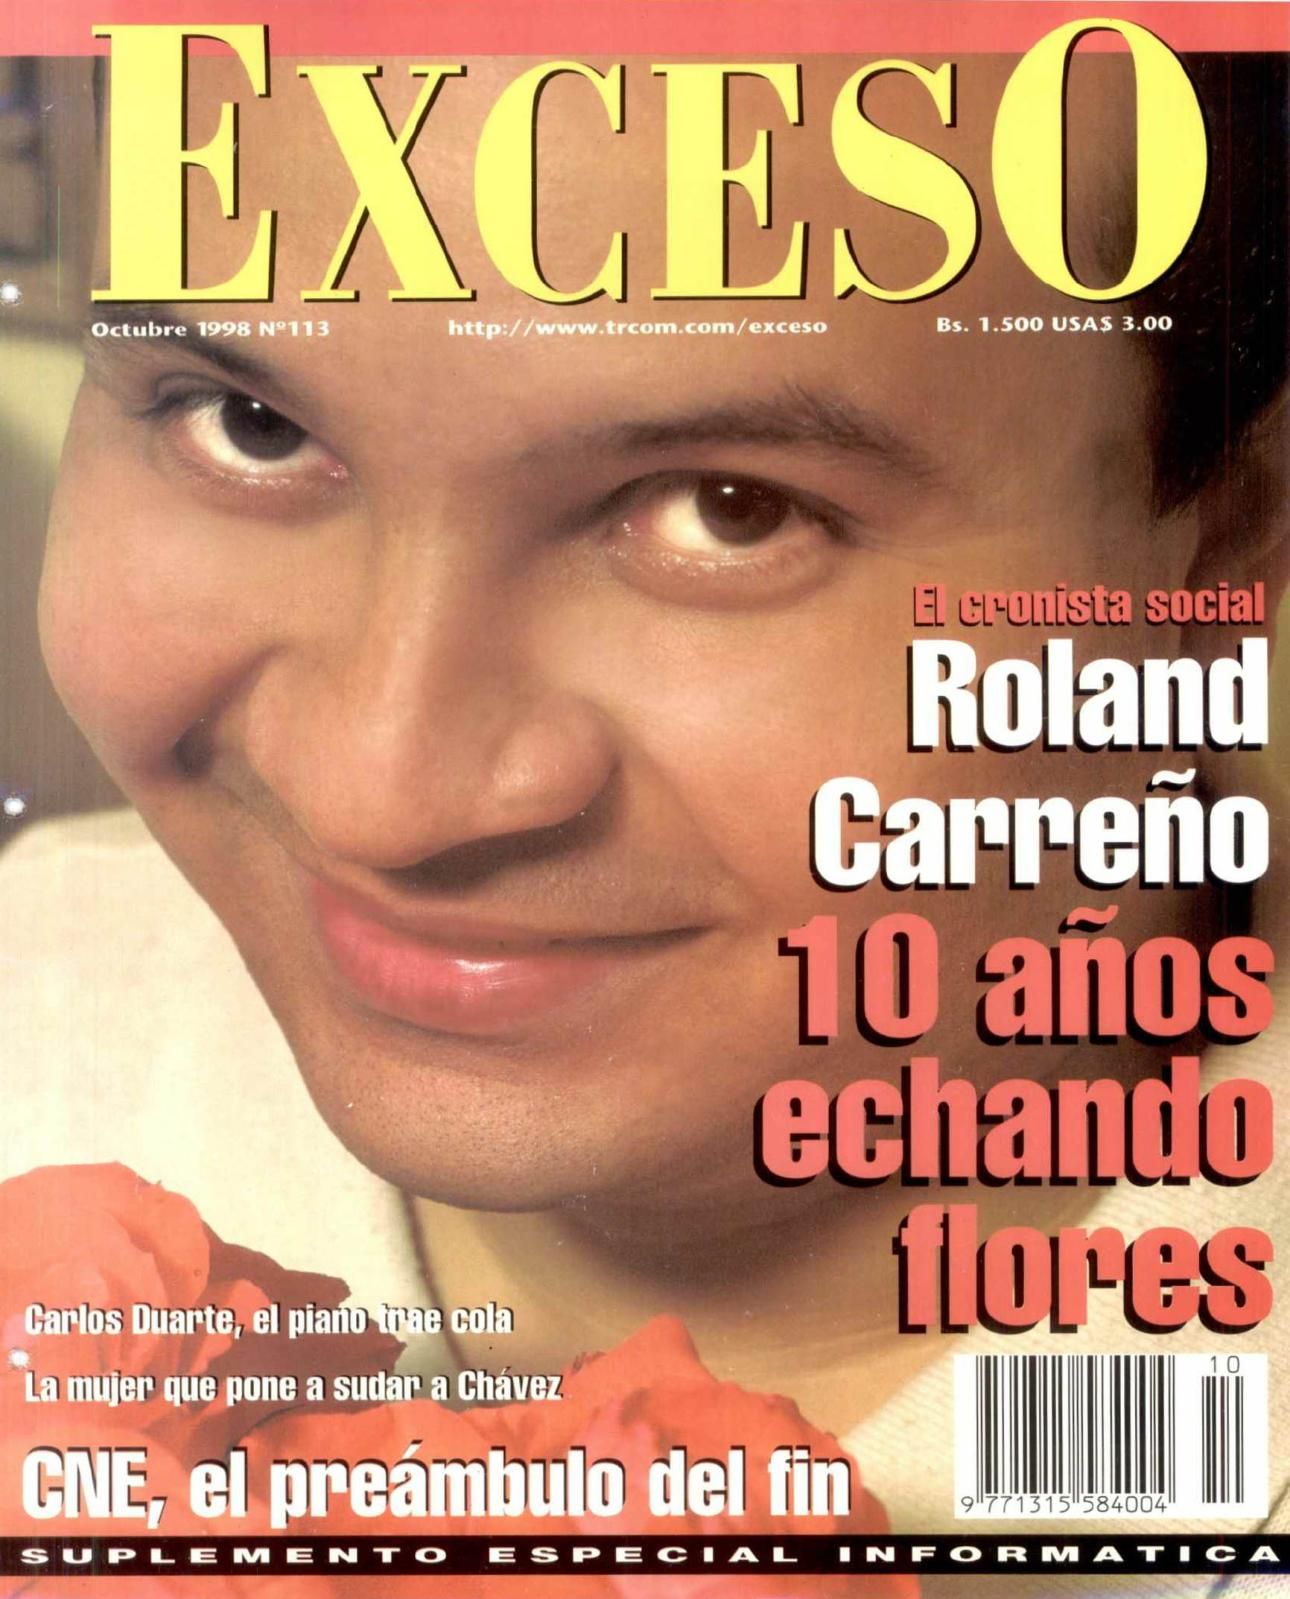 Batas Con Botones Al Frente Videos Porno calaméo - revista exceso ediciÓn nº 113 octubre 1998